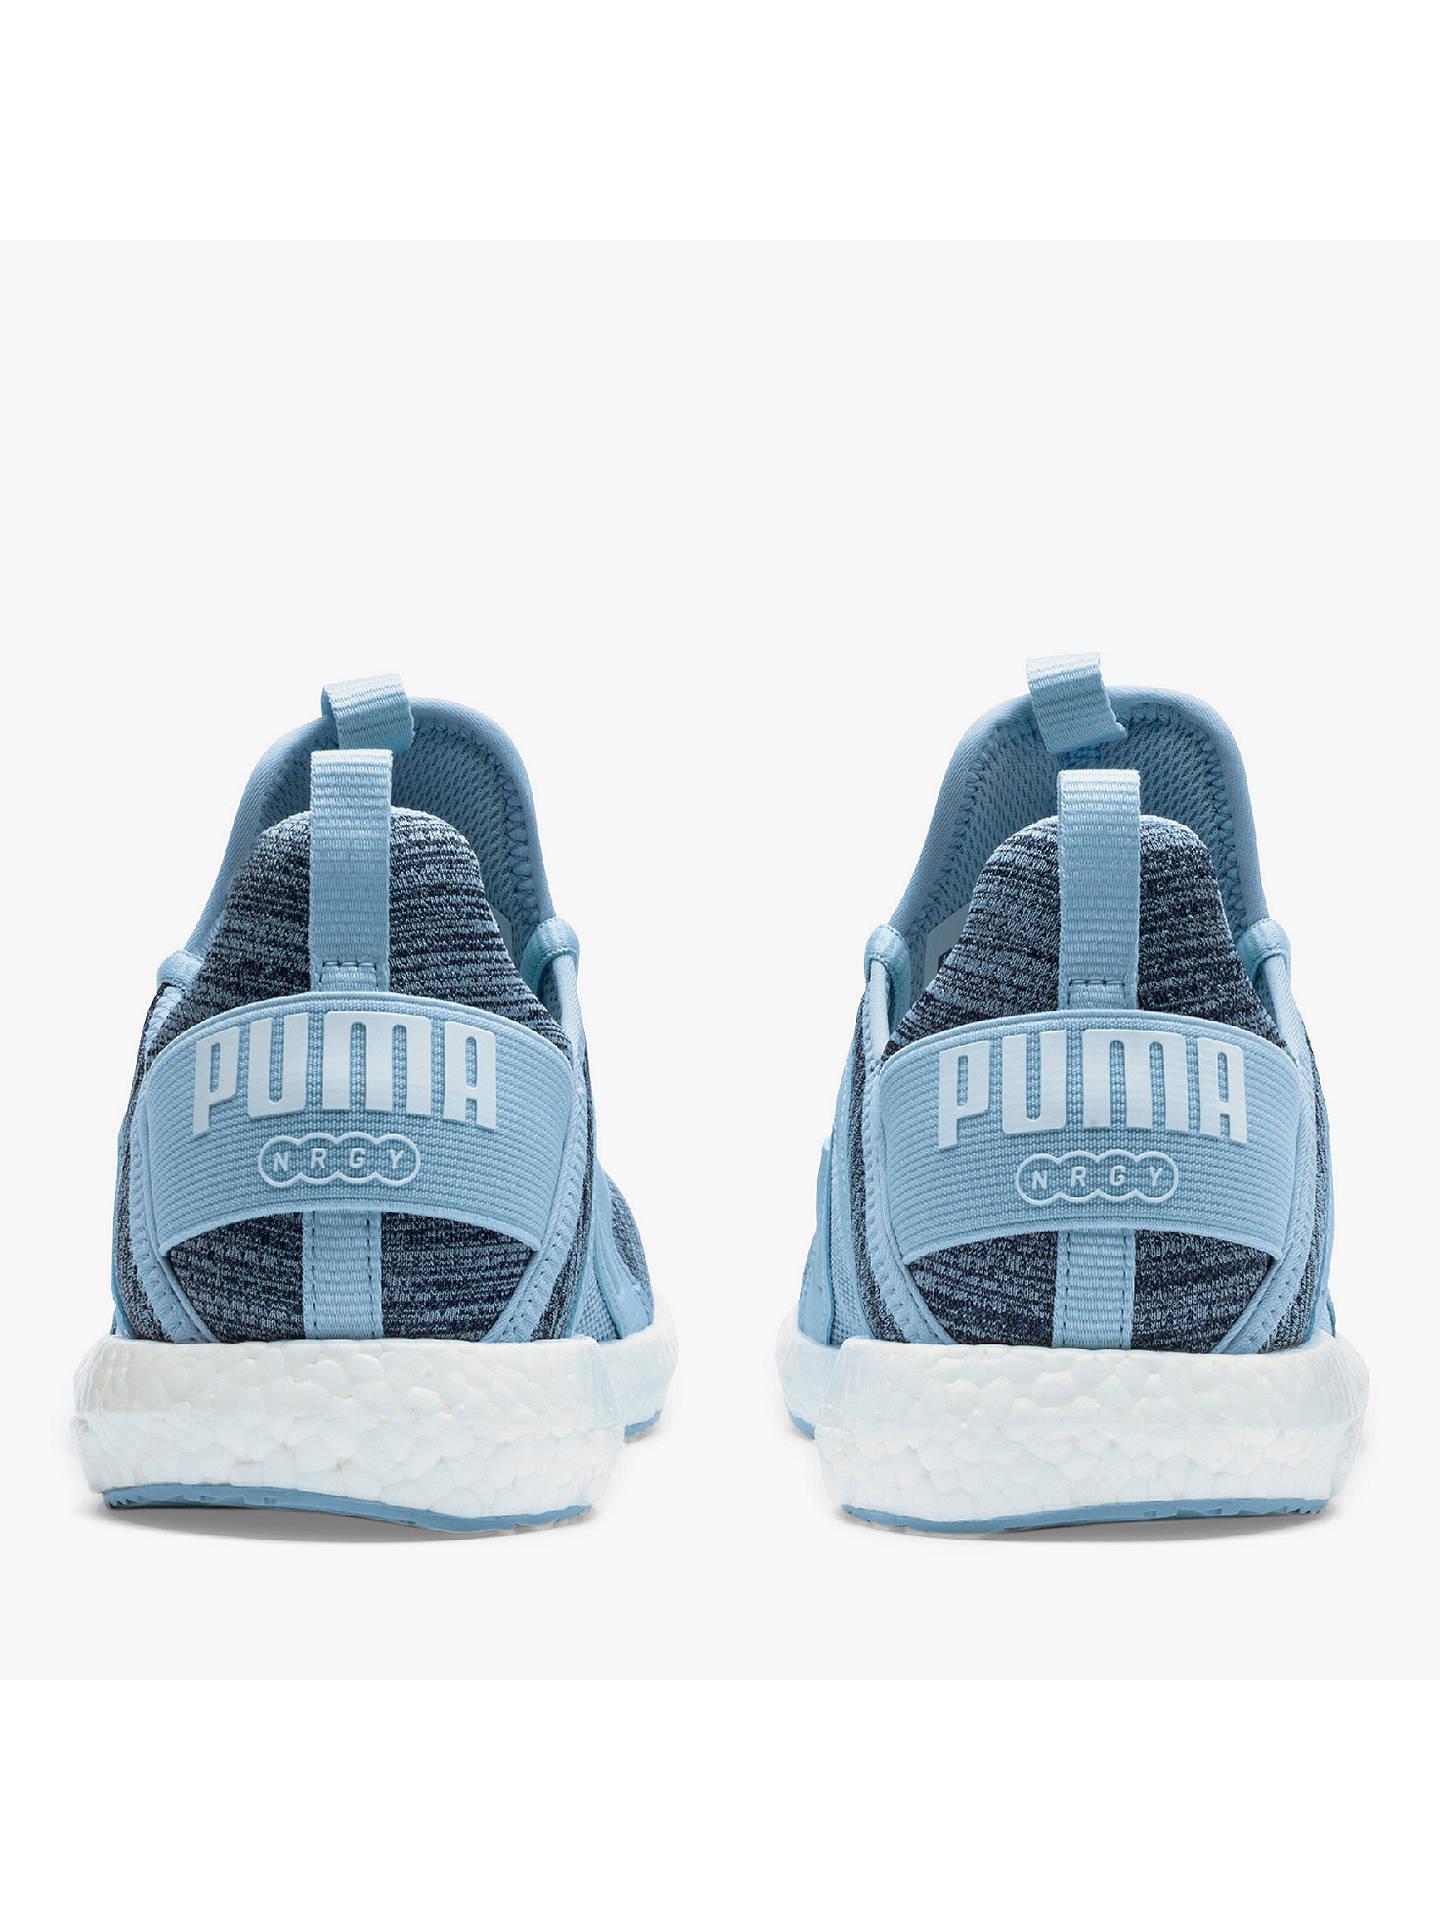 994e6211b PUMA Ignite Flash evoKNIT Women's Running Shoes, Cerulean/Quarry ...